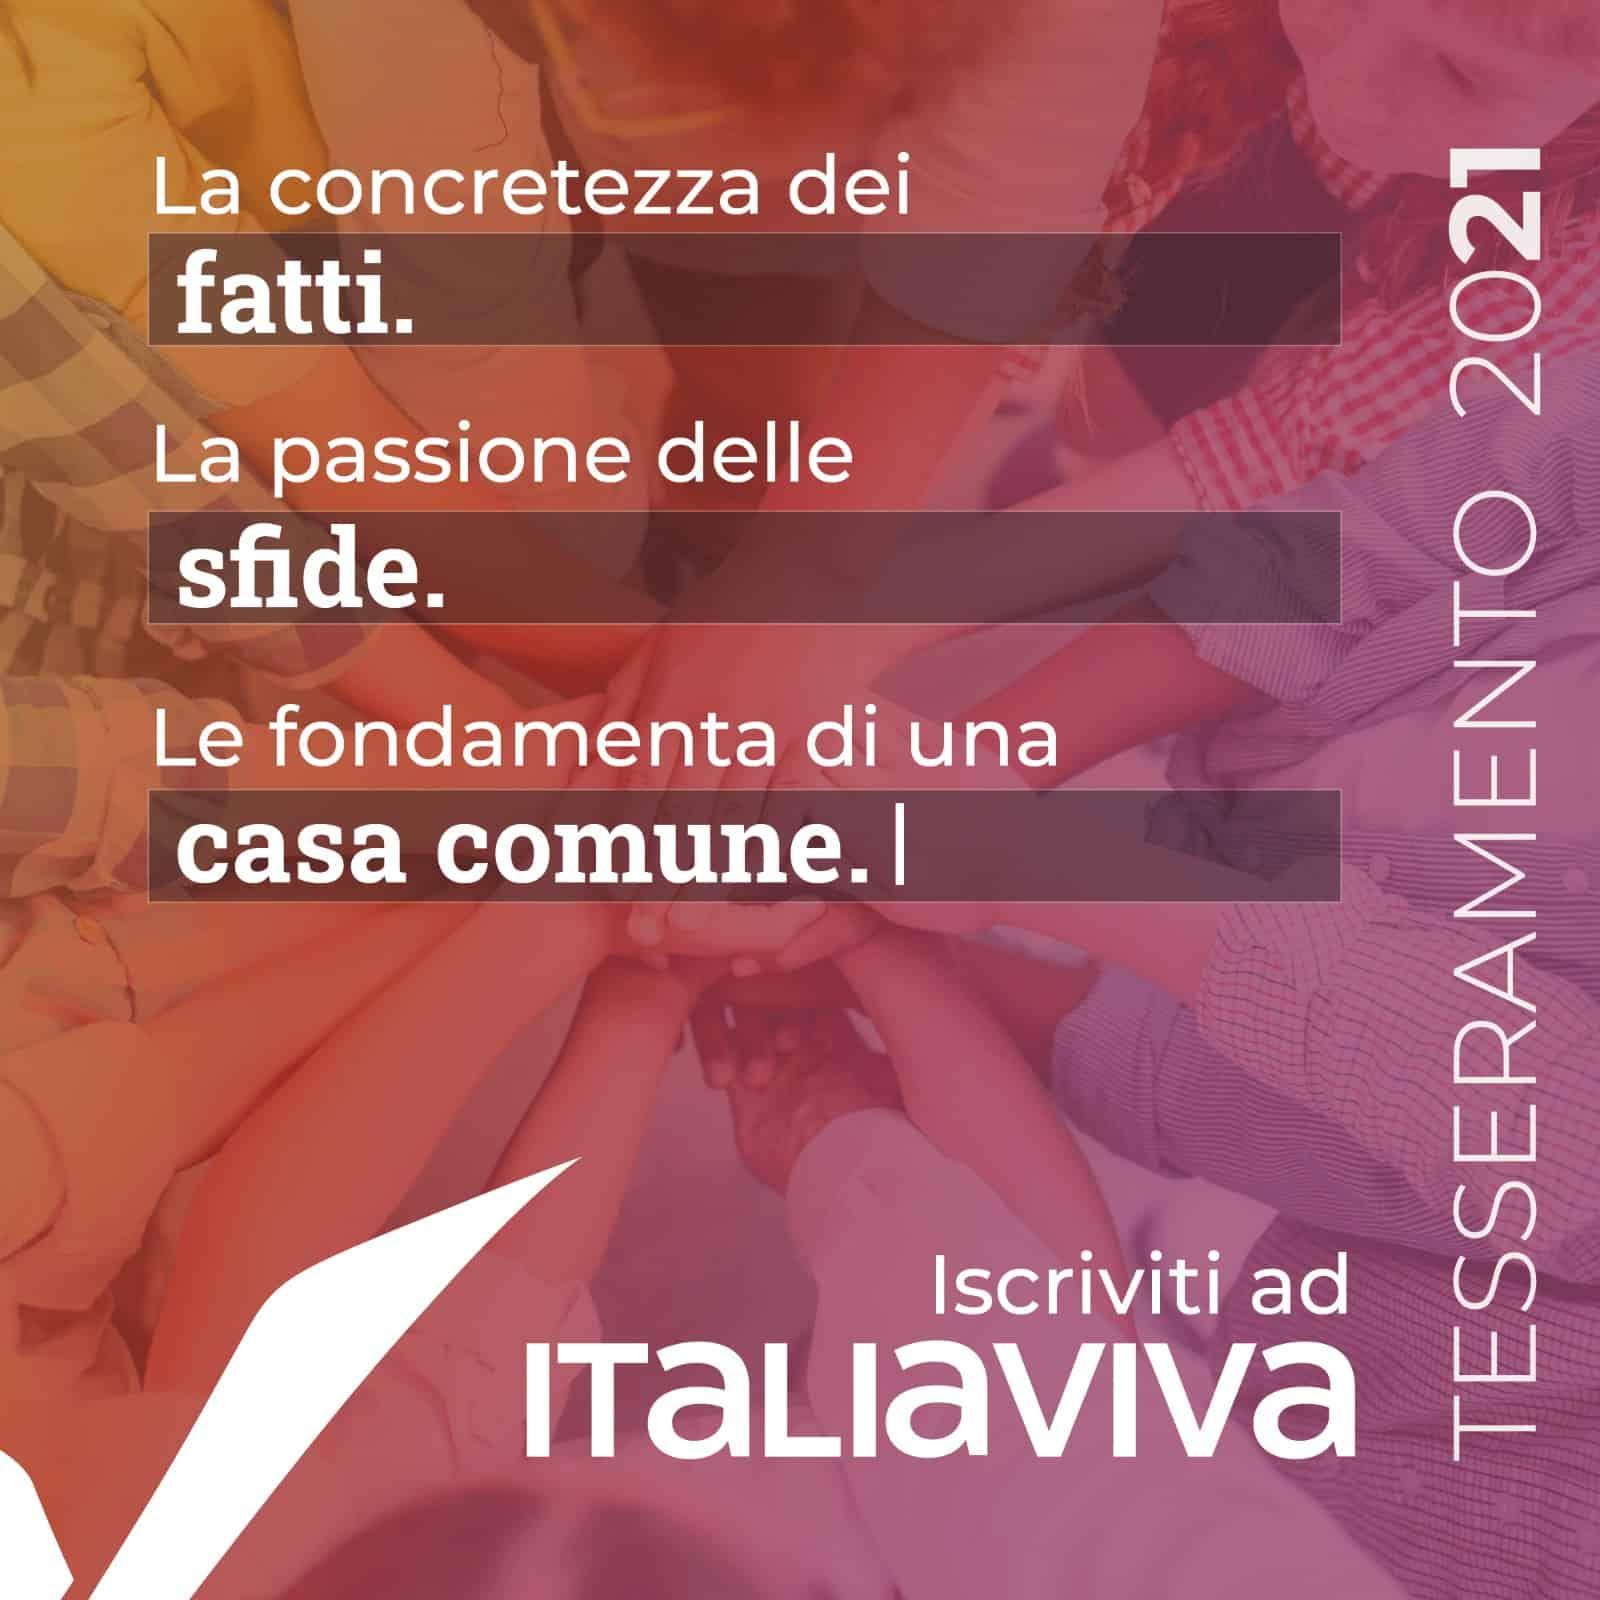 tesseramento italiaviva 2021